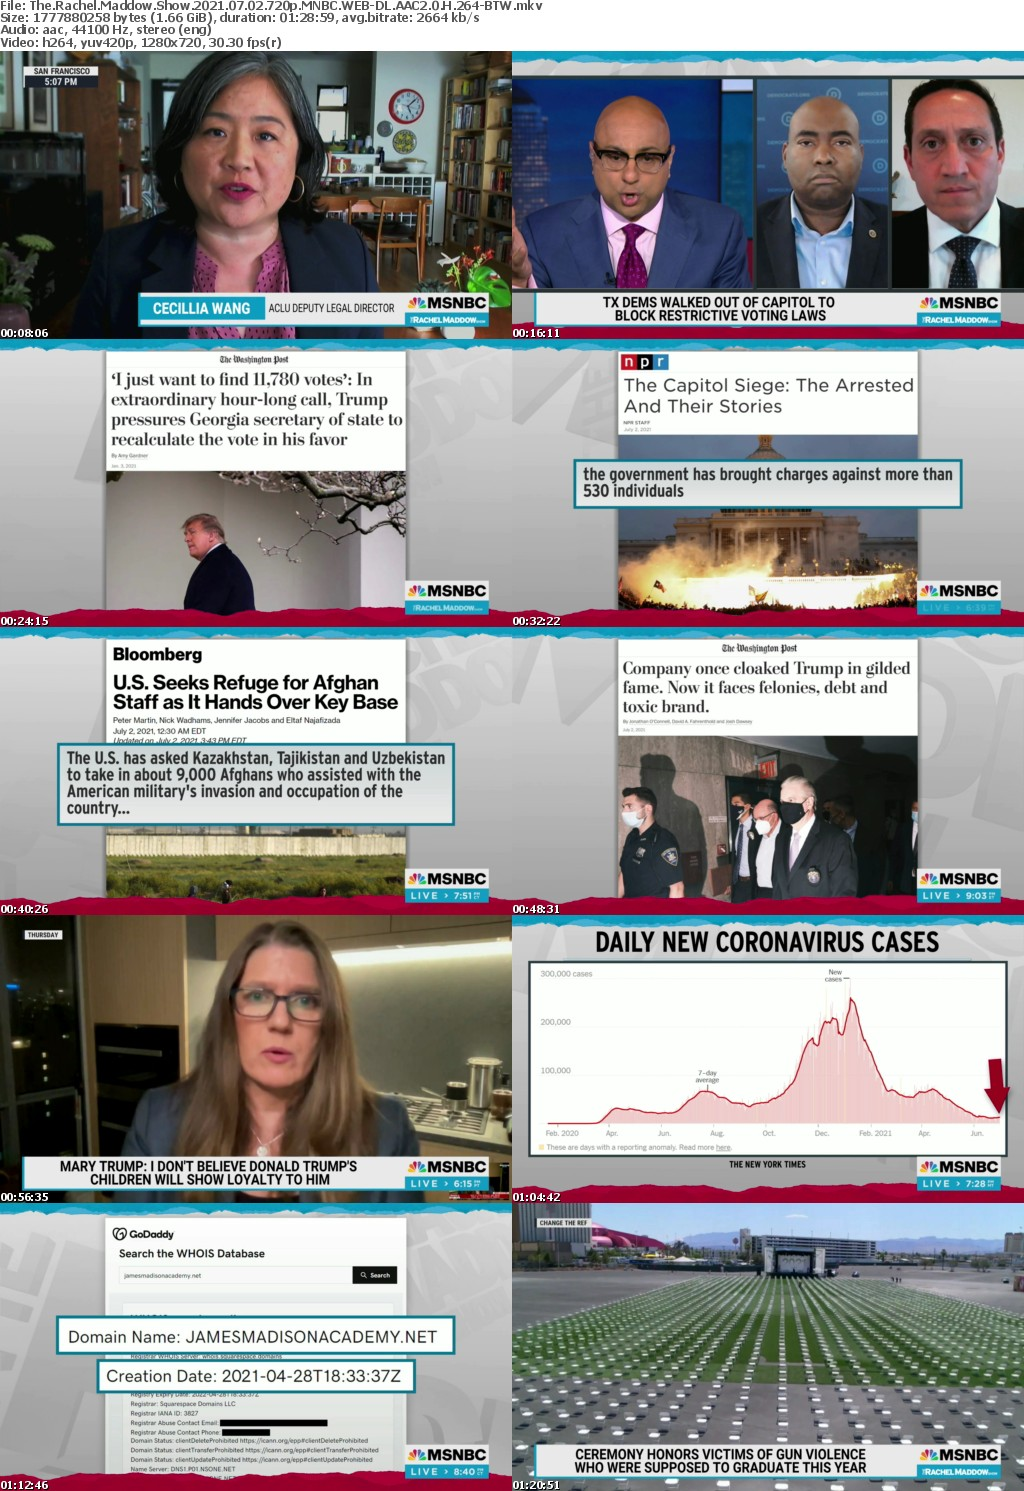 The Rachel Maddow Show 2021 07 02 720p MNBC WEBRip AAC2 0 H264-BTW